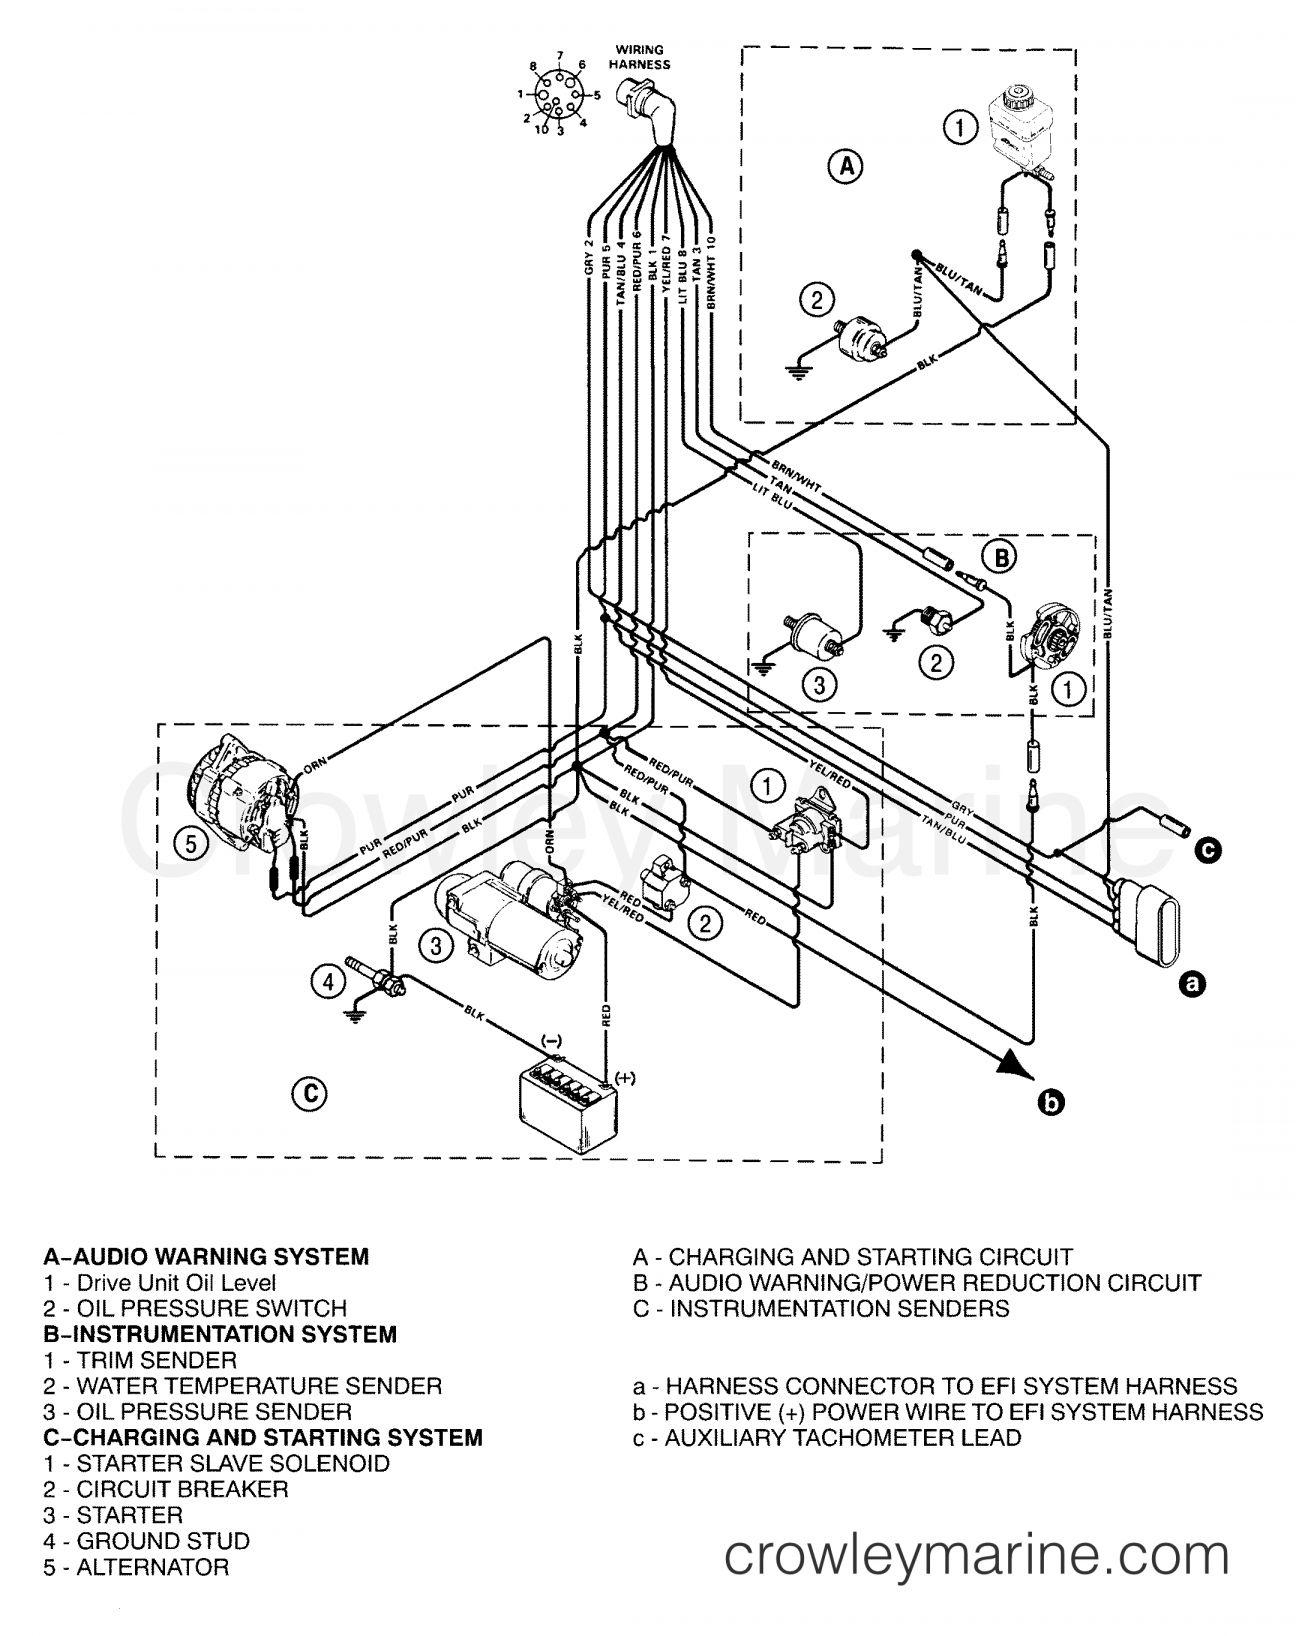 Mercruiser 140 Engine Wiring Diagram and Marine Pin